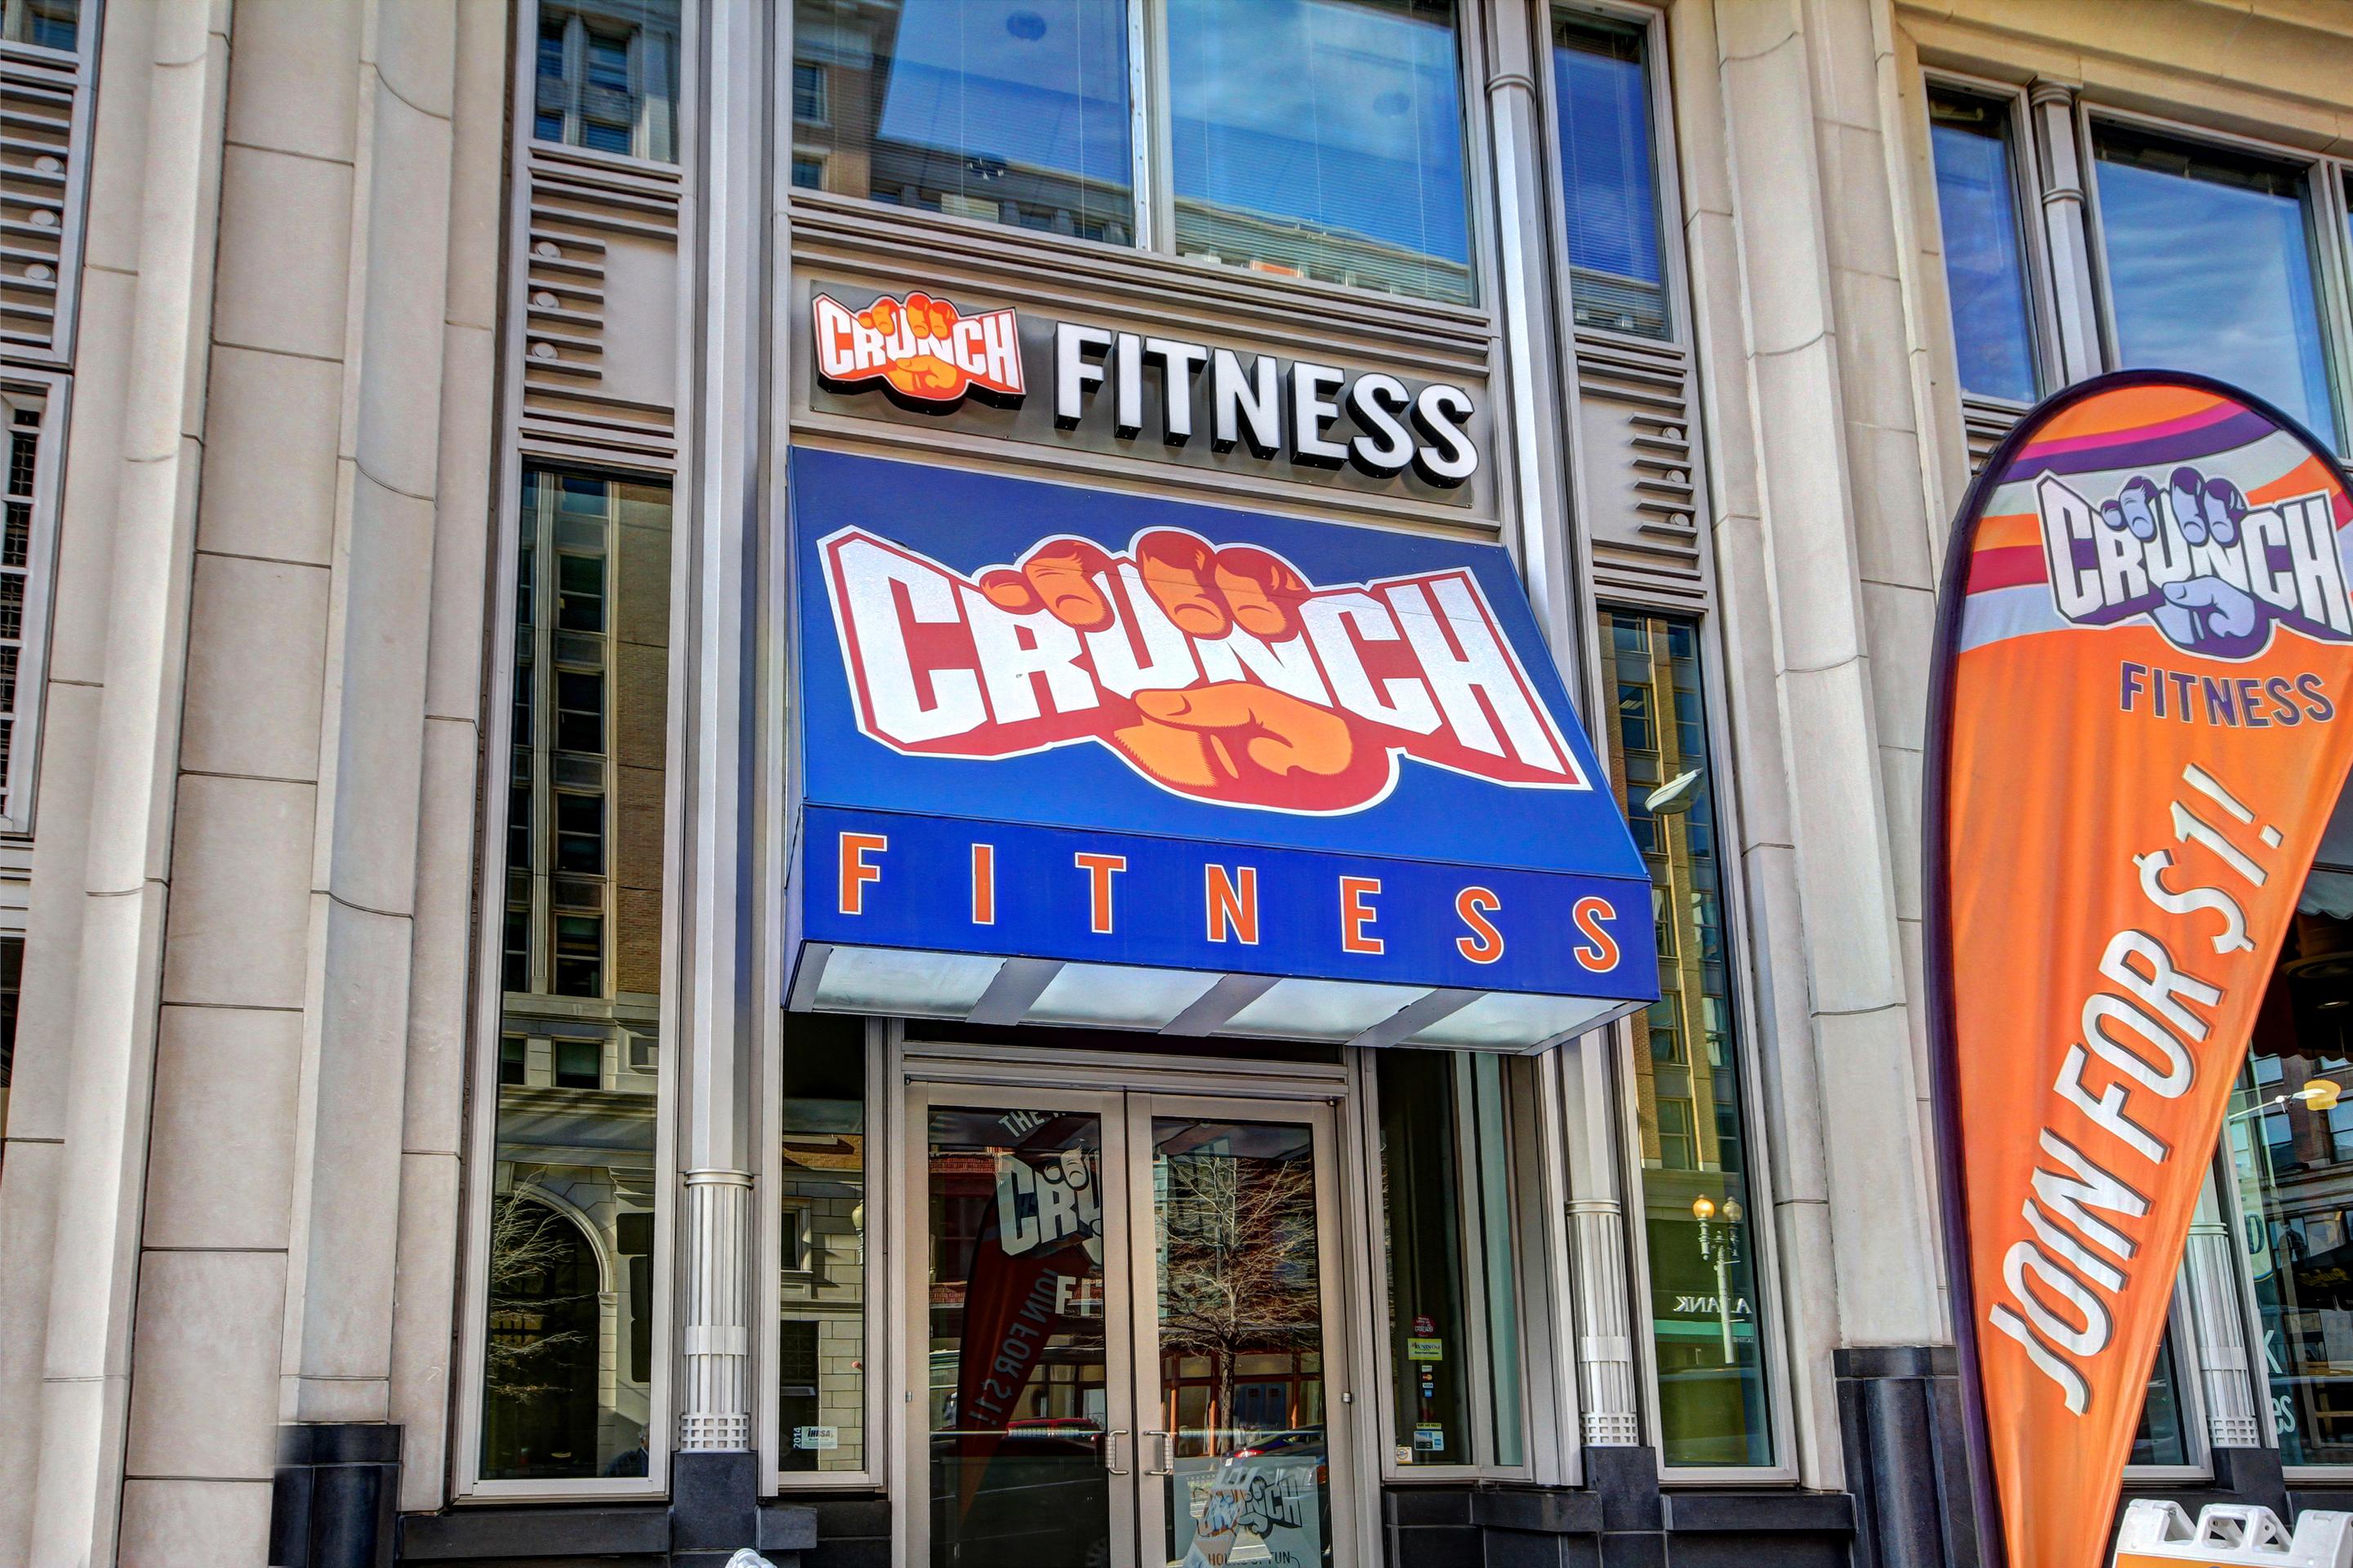 Crunch Fitness - Metro Center image 0